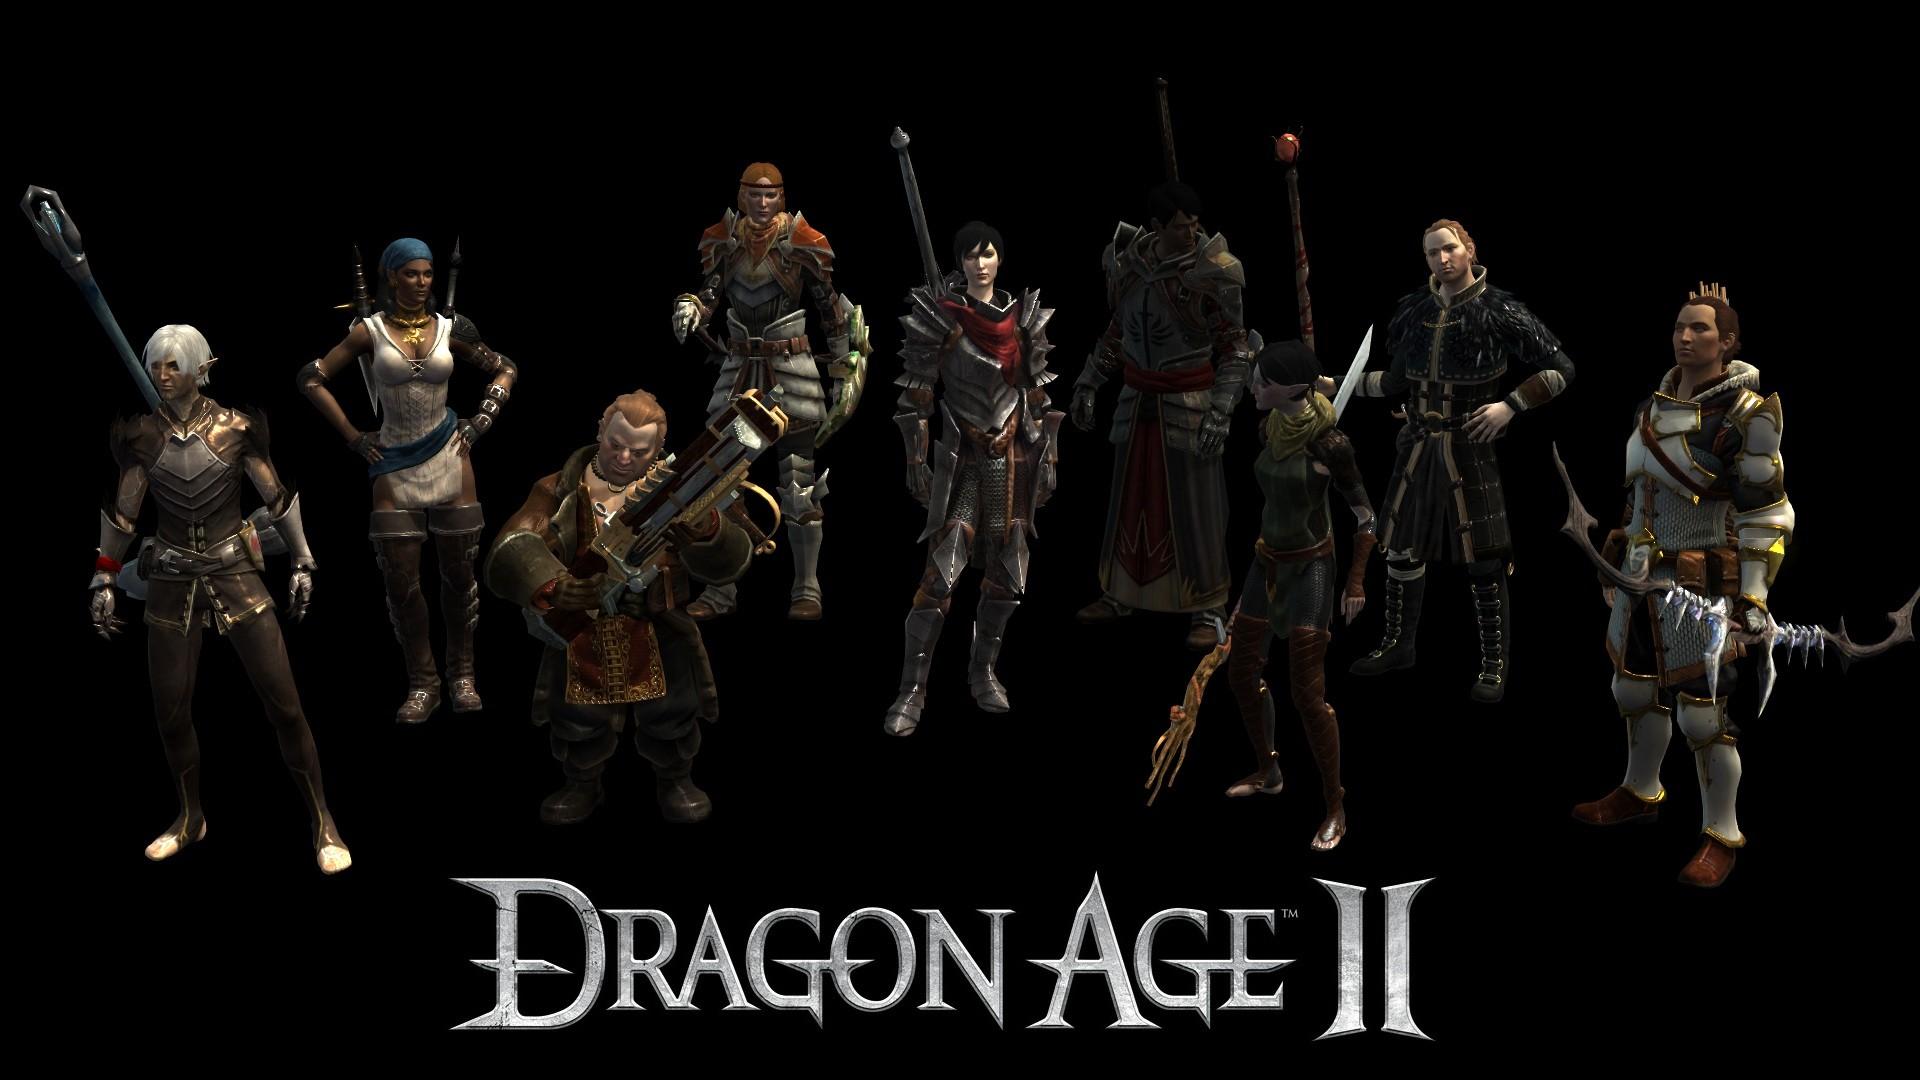 73 Dragon Age 2 Hd